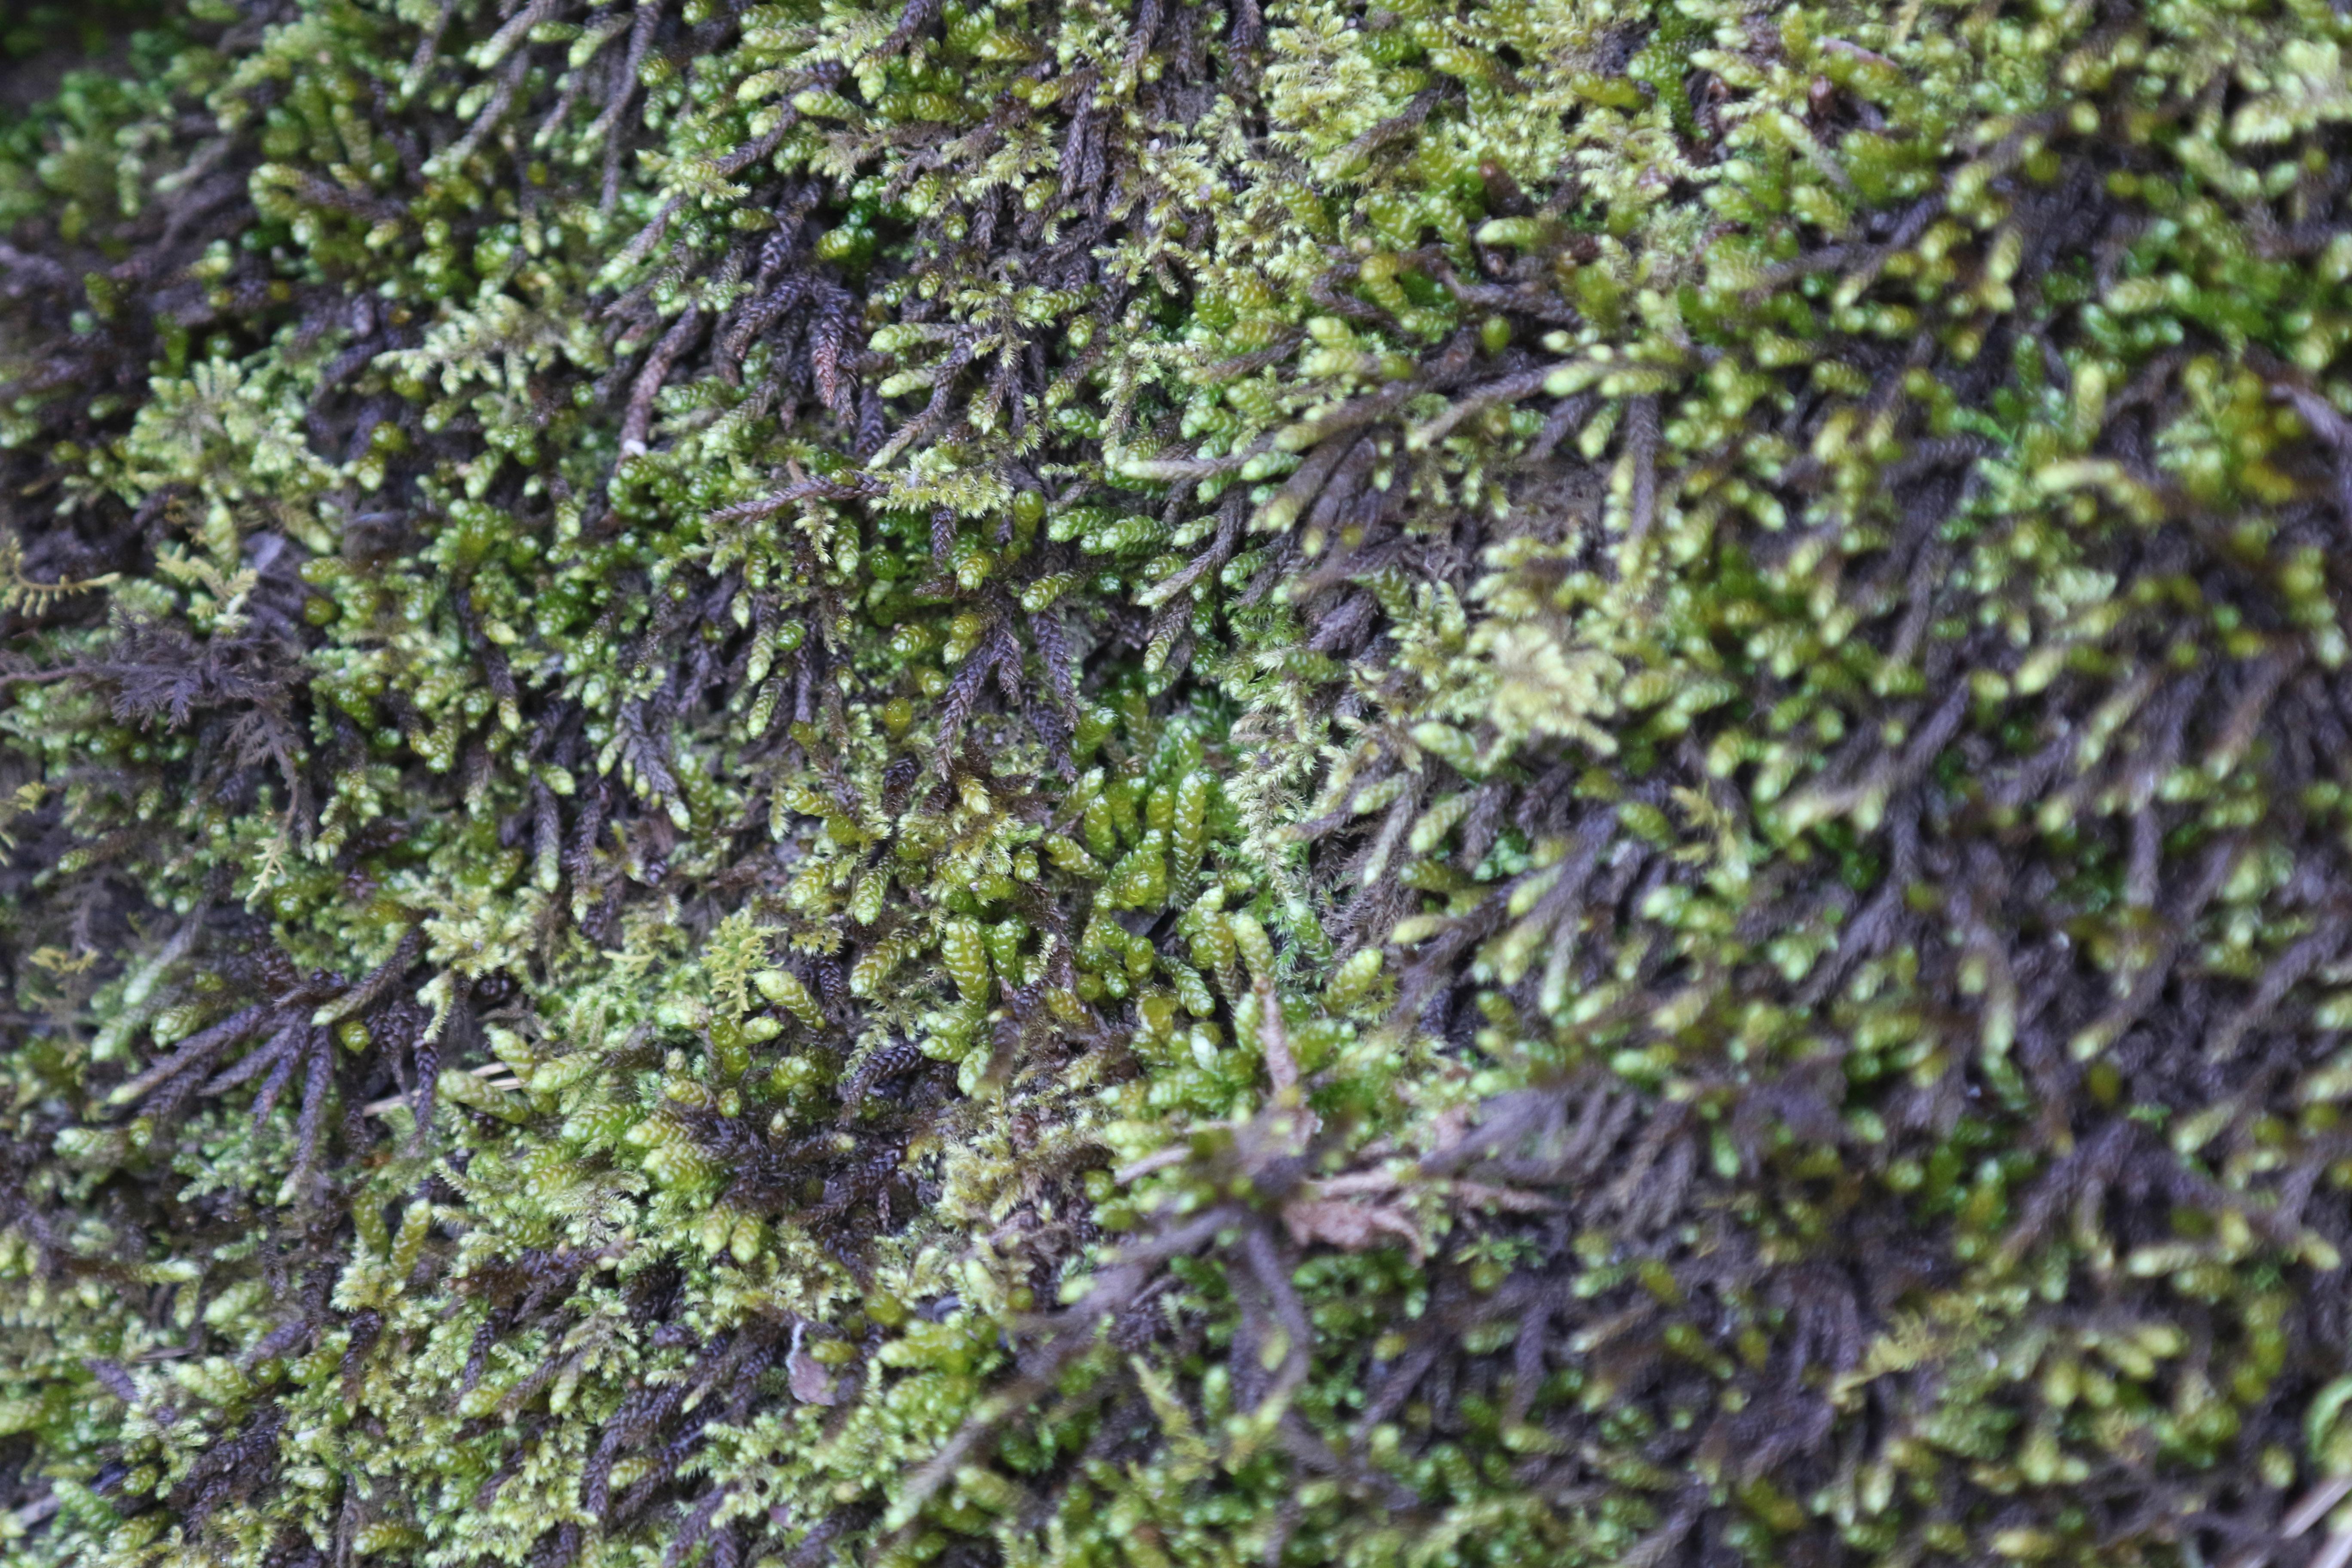 A close-up photo of dark green moss